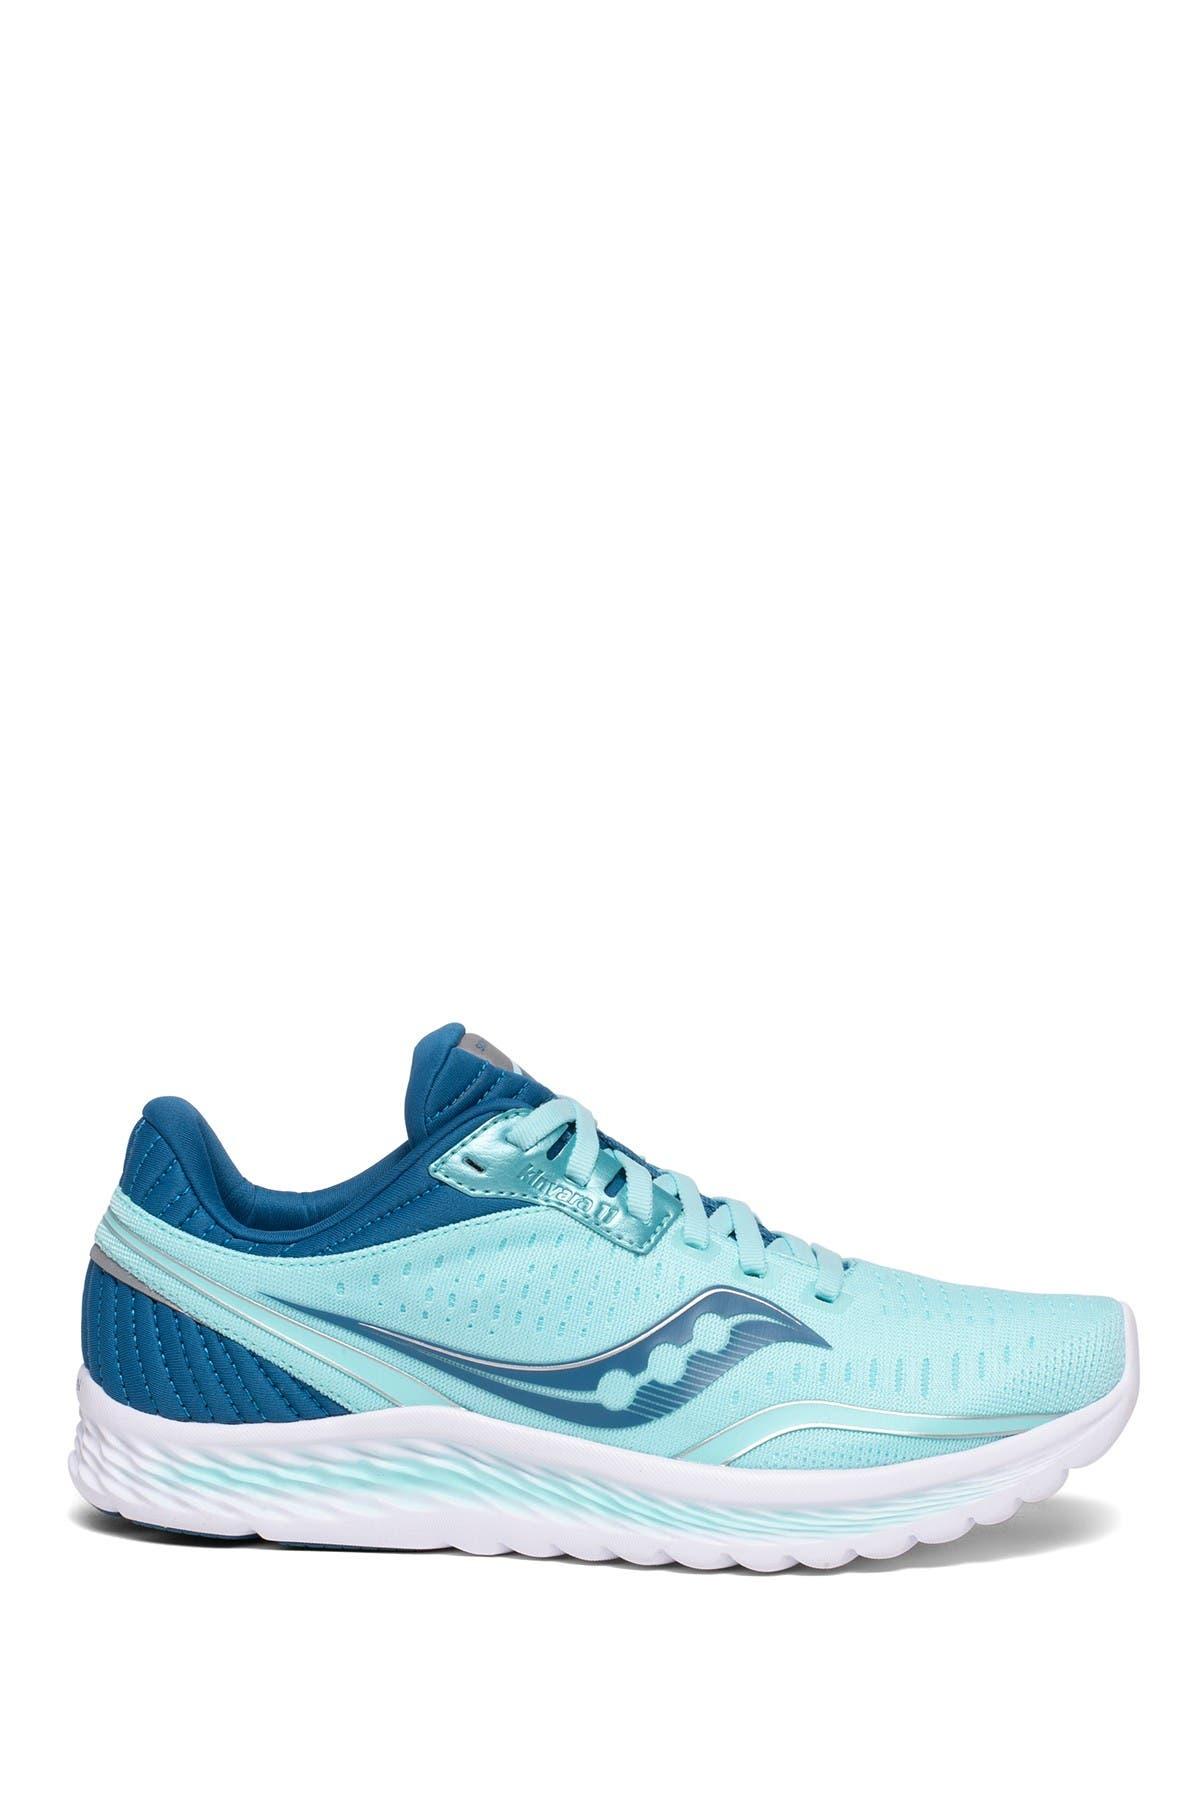 Image of Saucony Kinvara 11 Running Sneaker